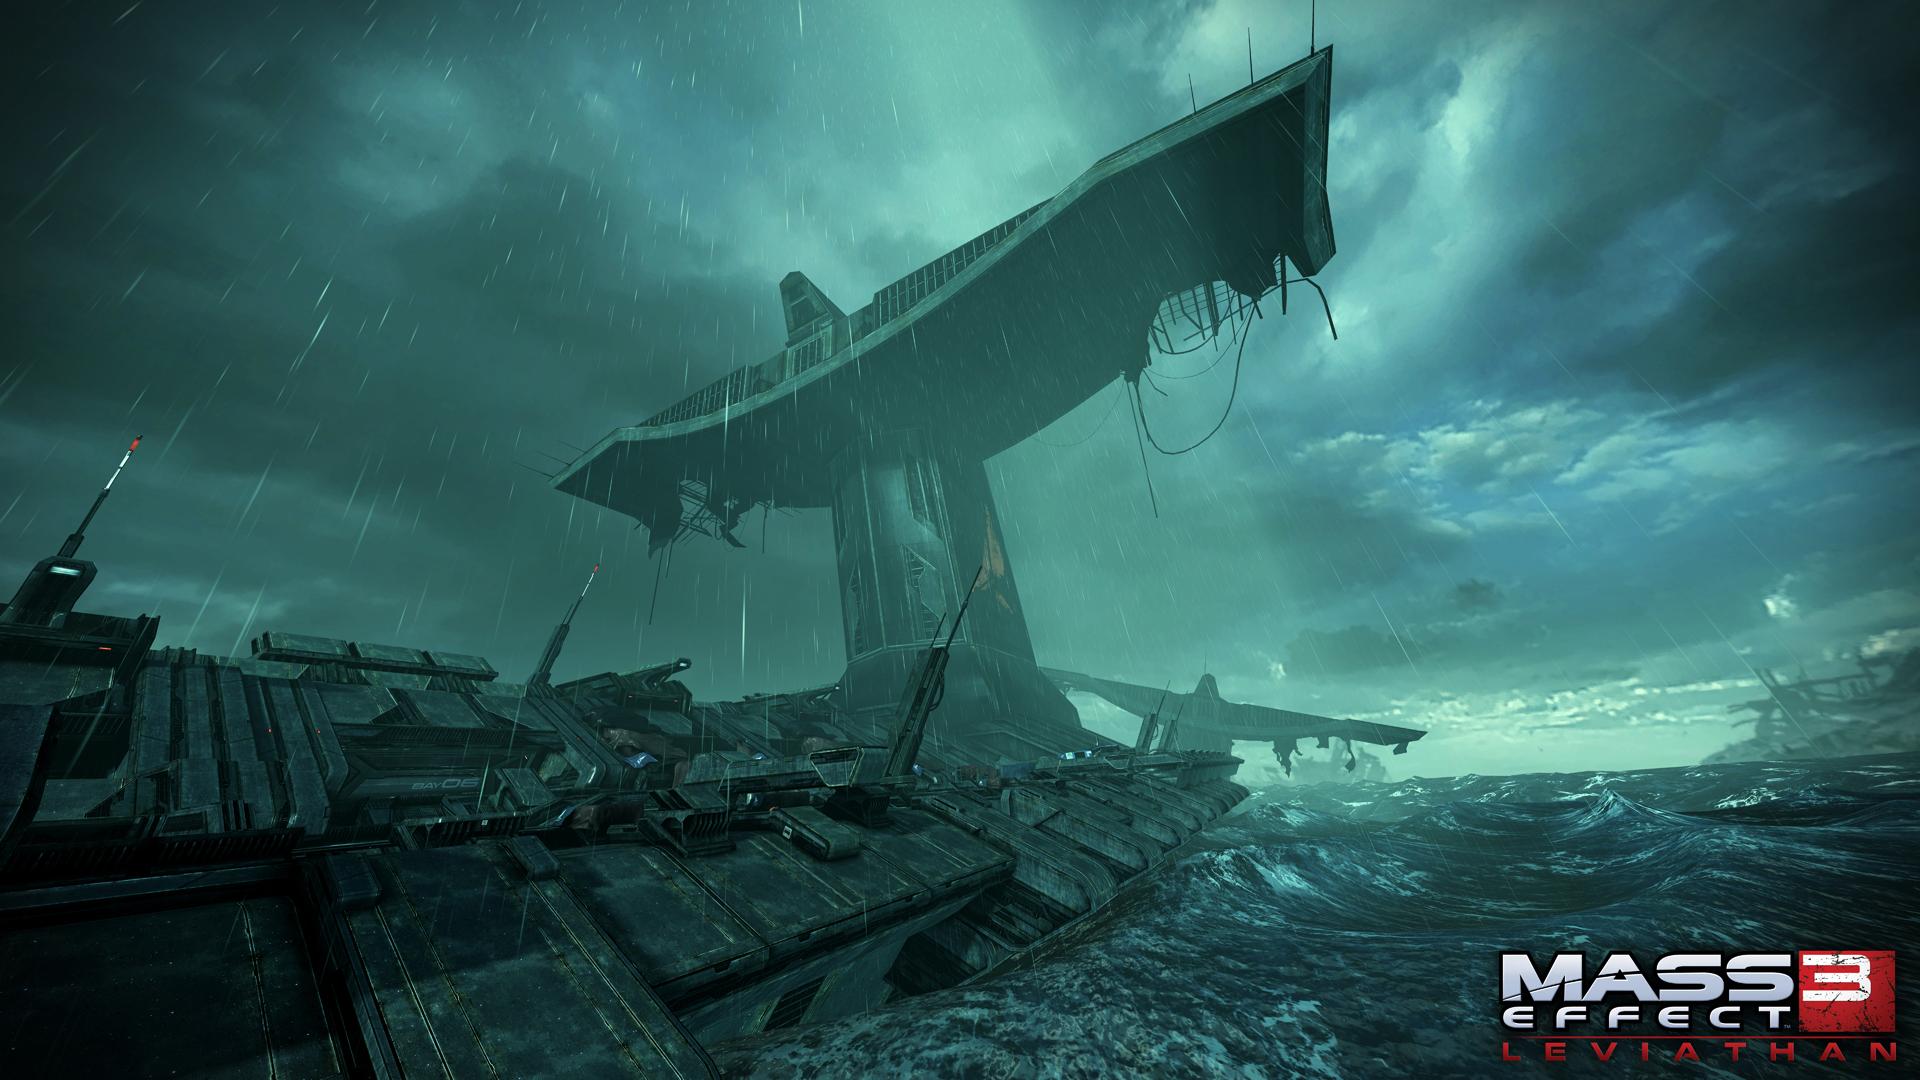 [Mass Effect3] Leviathan DLC 다 했음.